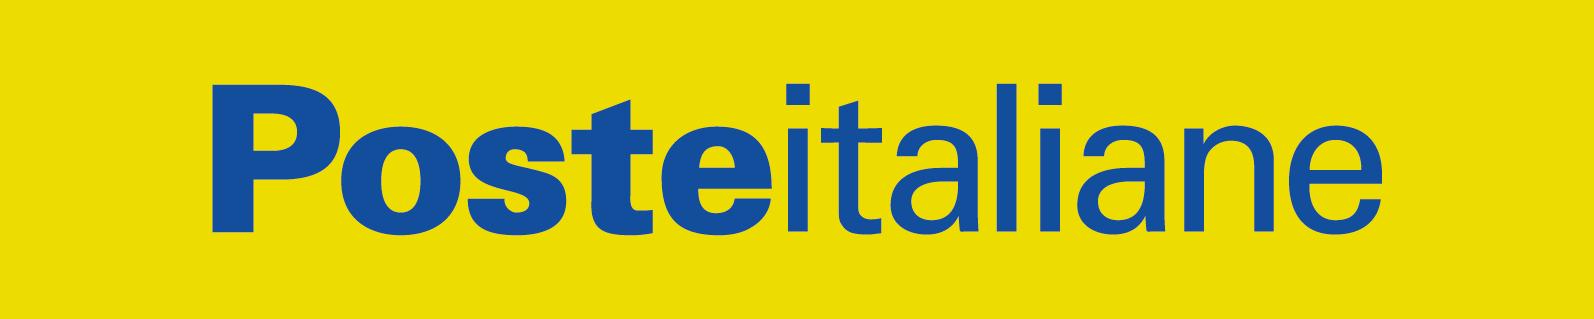 poste-italiane--sa-giovanni-di-gerace-atm-radio-gioiosa-marina-news-1